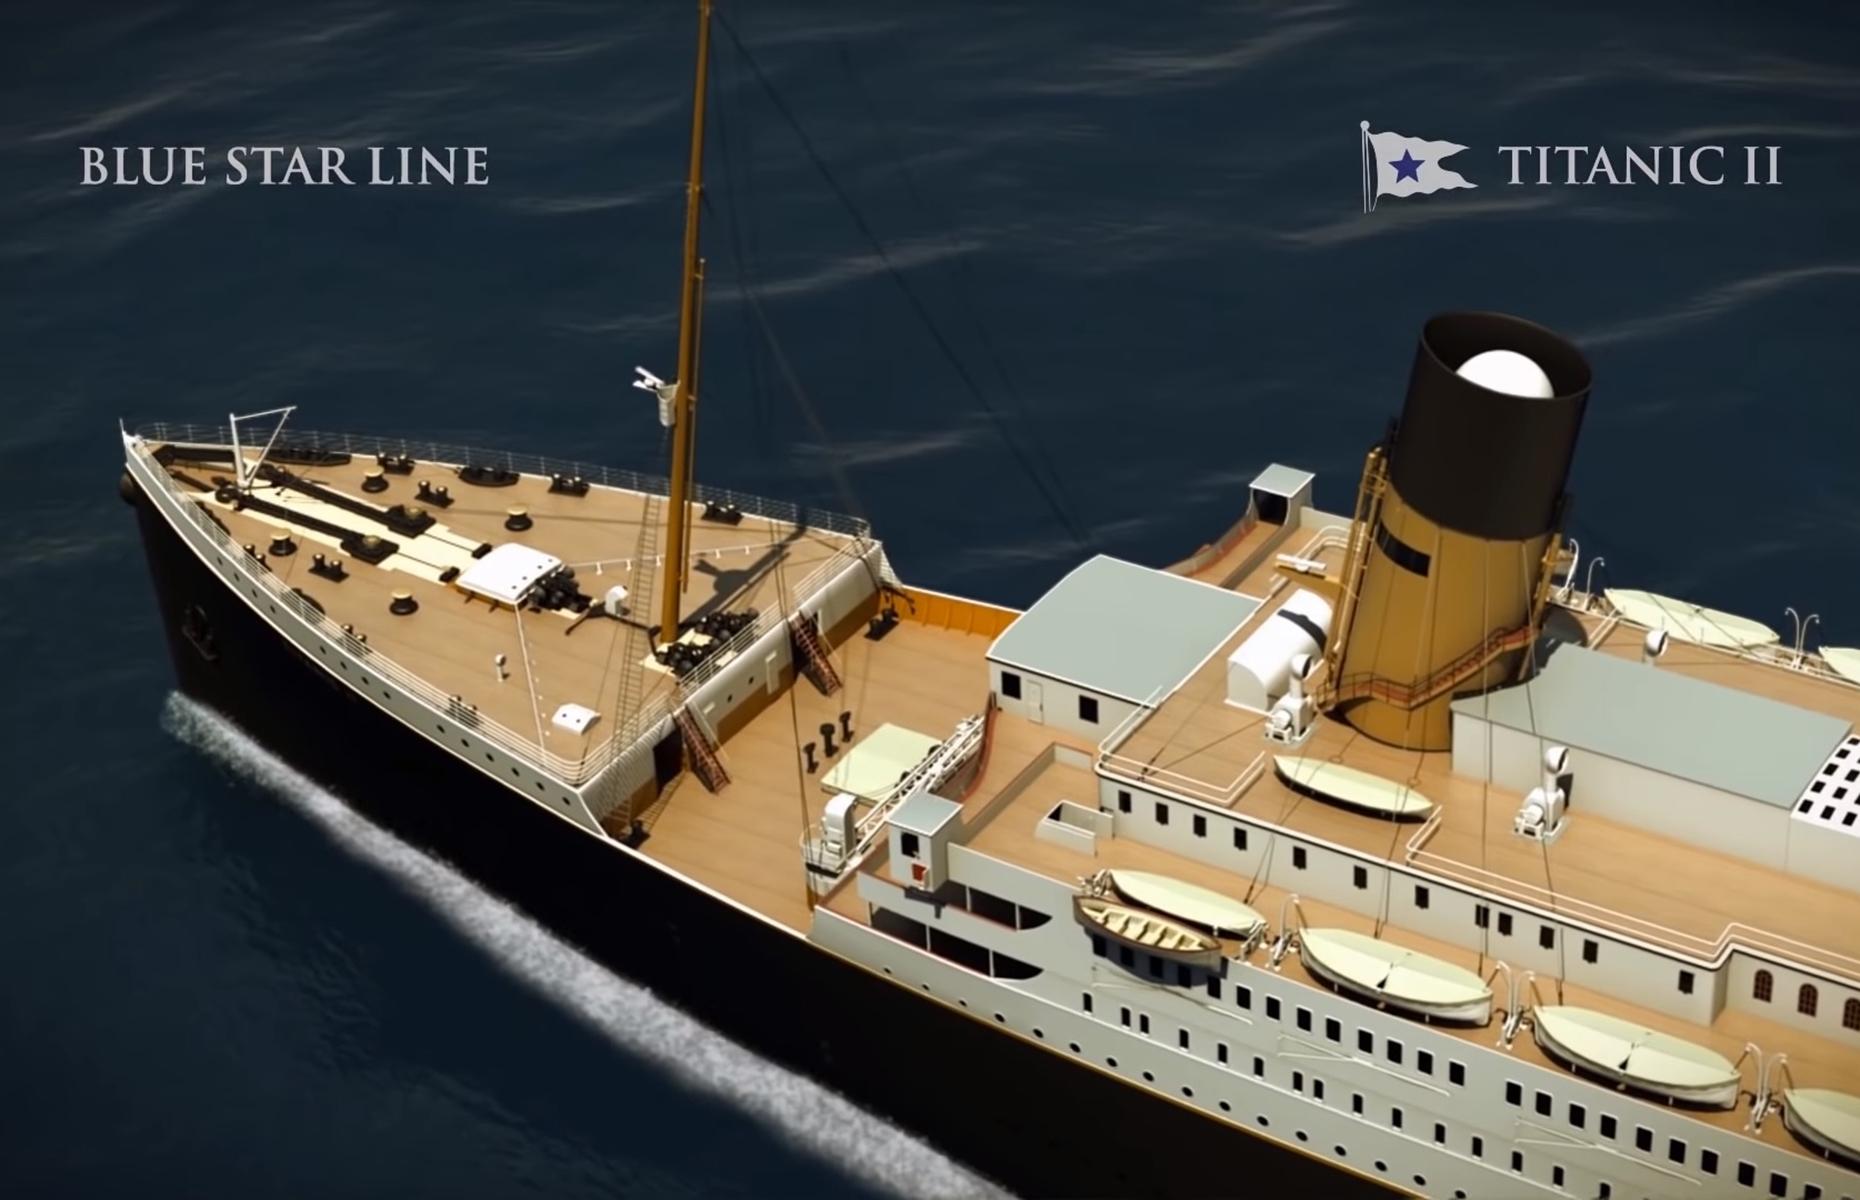 Clive Palmer & # 39; s Titanic. Image: Blue Star Line / YouTube